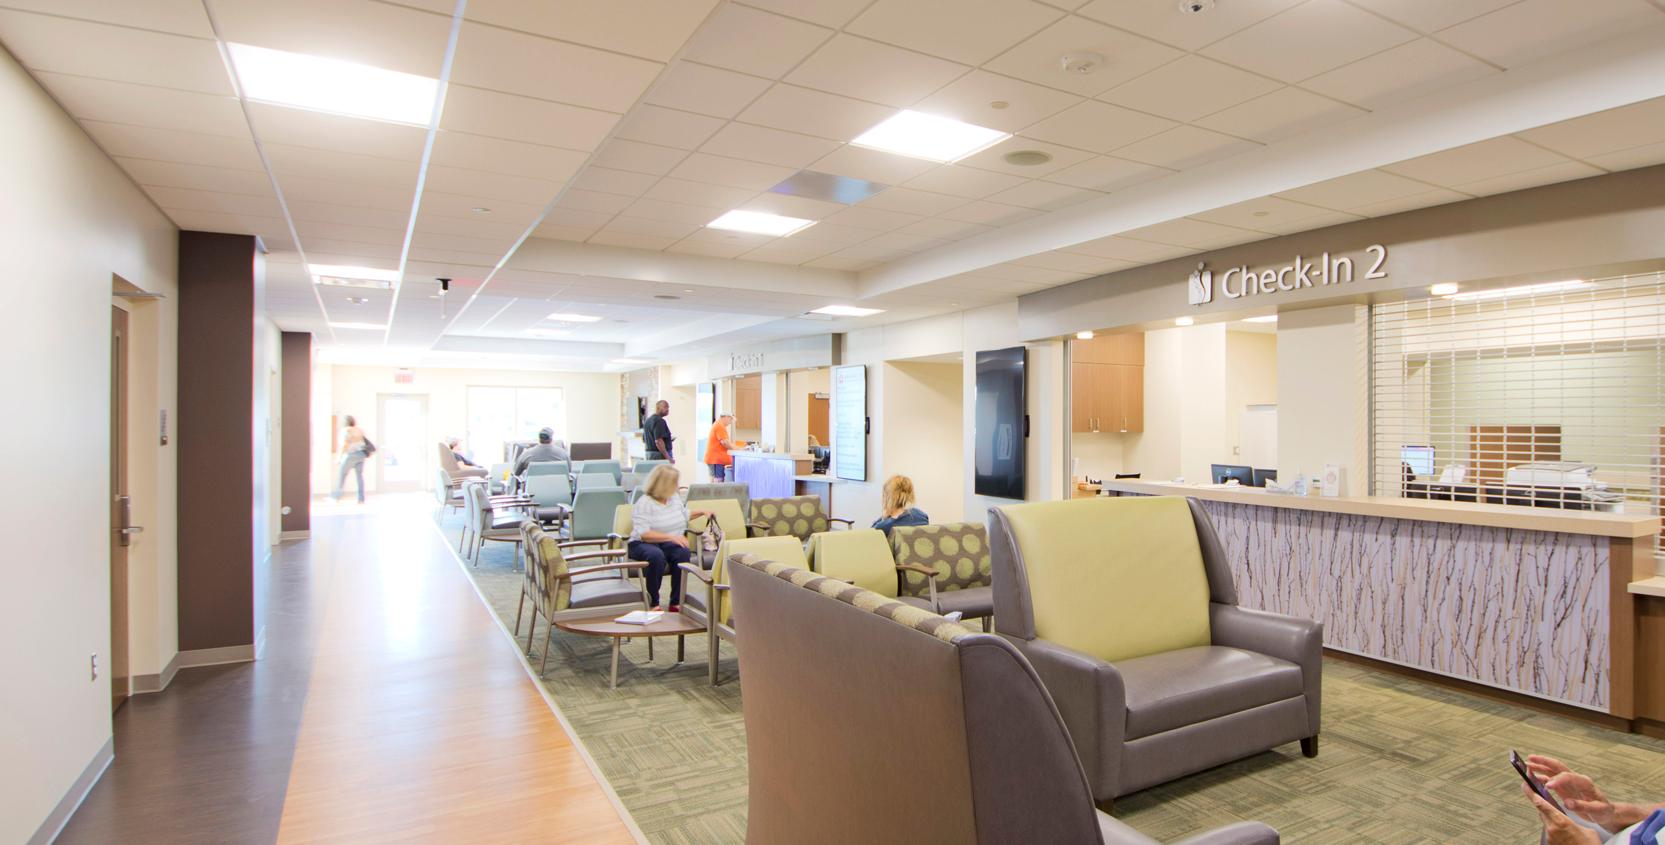 SJMH-Mendelson-Kornblum-Orthopedics-MOB-Patient-Lobby-2-1665x845